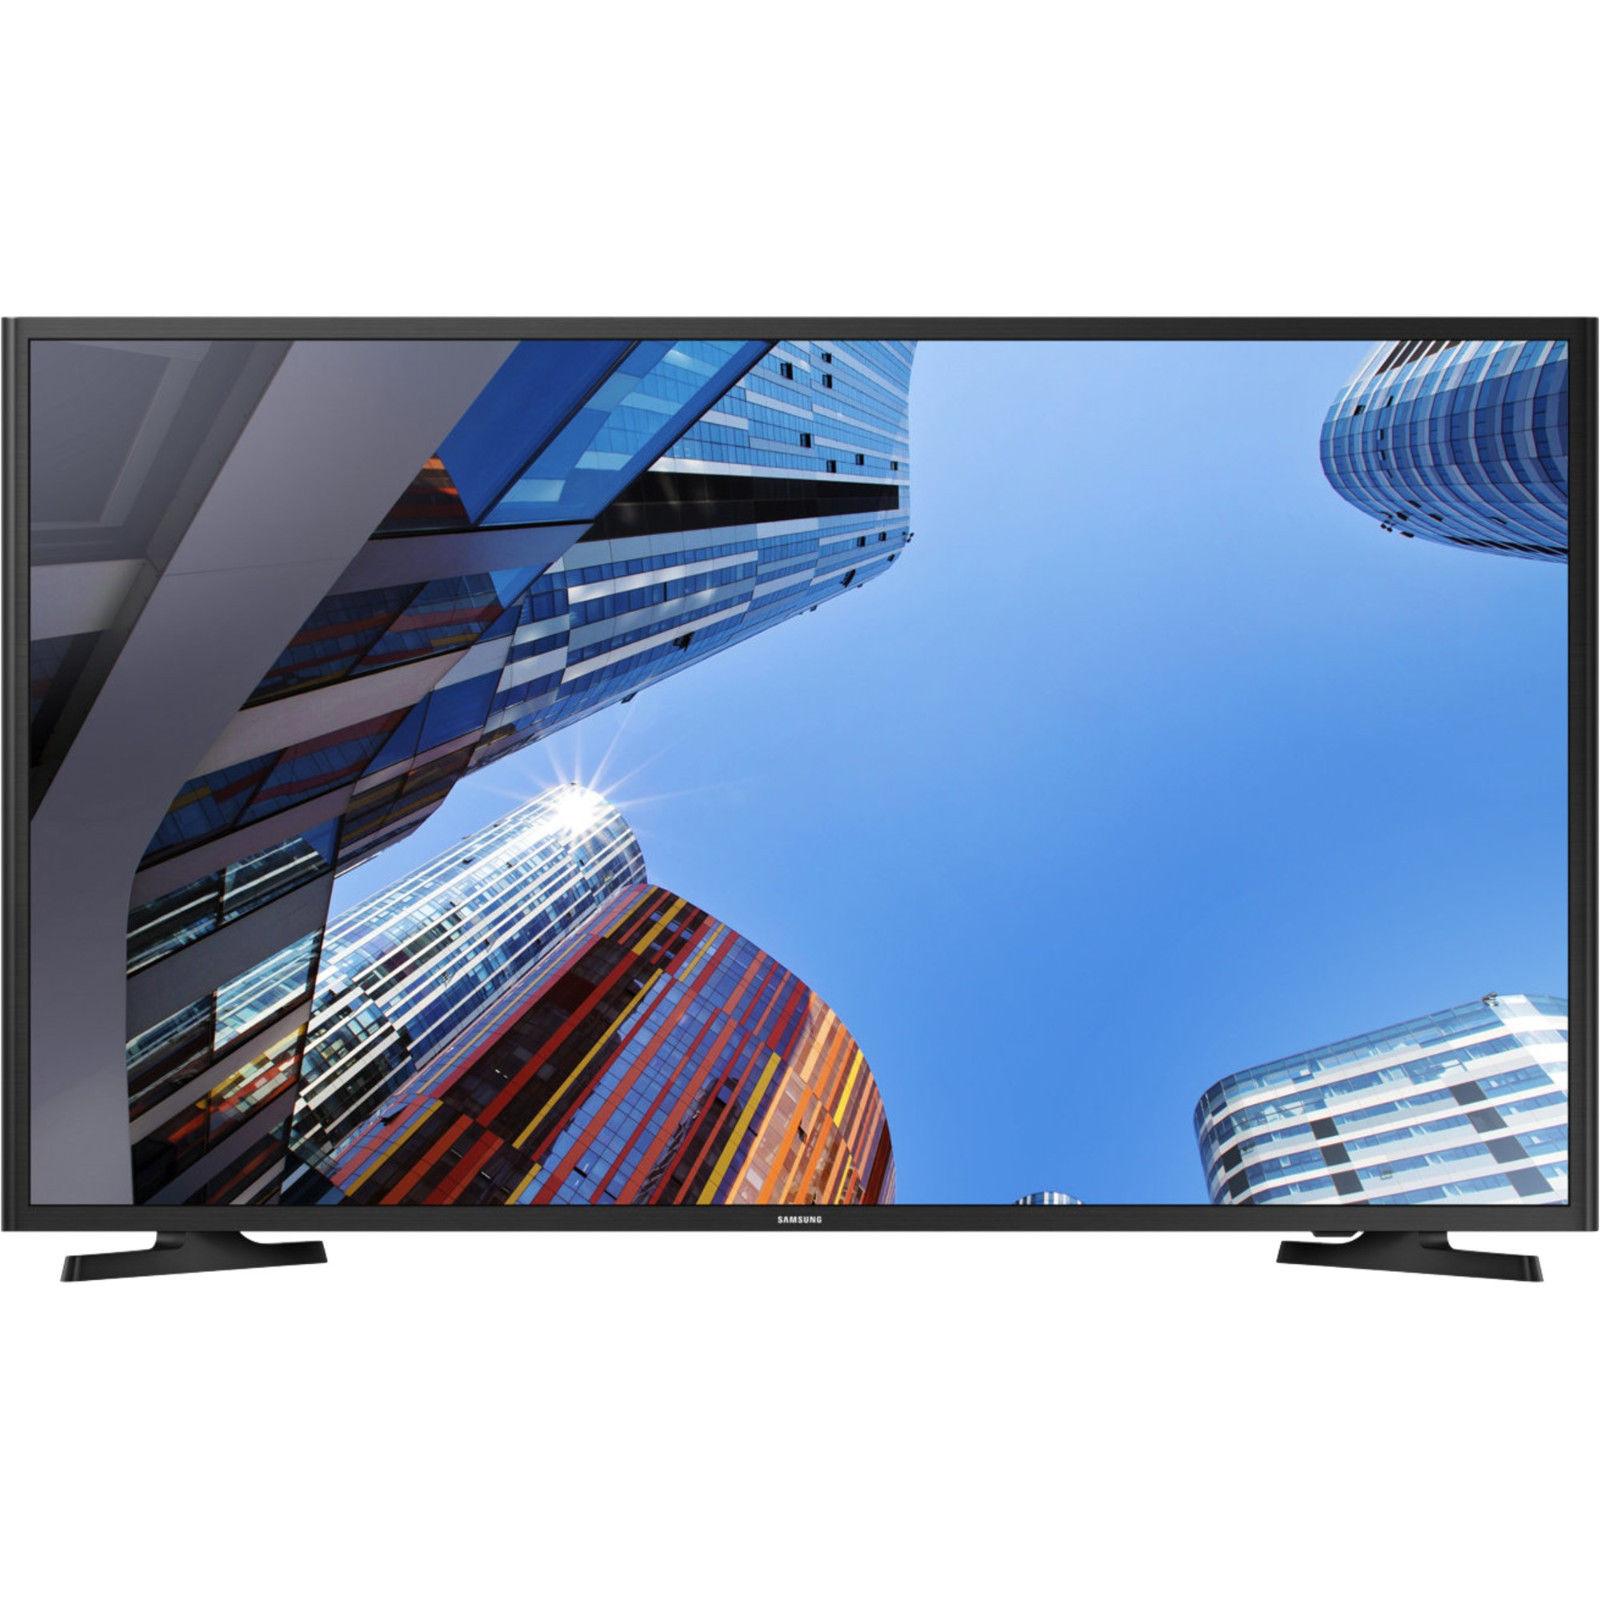 Samsung UE-49M5075 49 Zoll Full-HD LED TV Triple Tuner